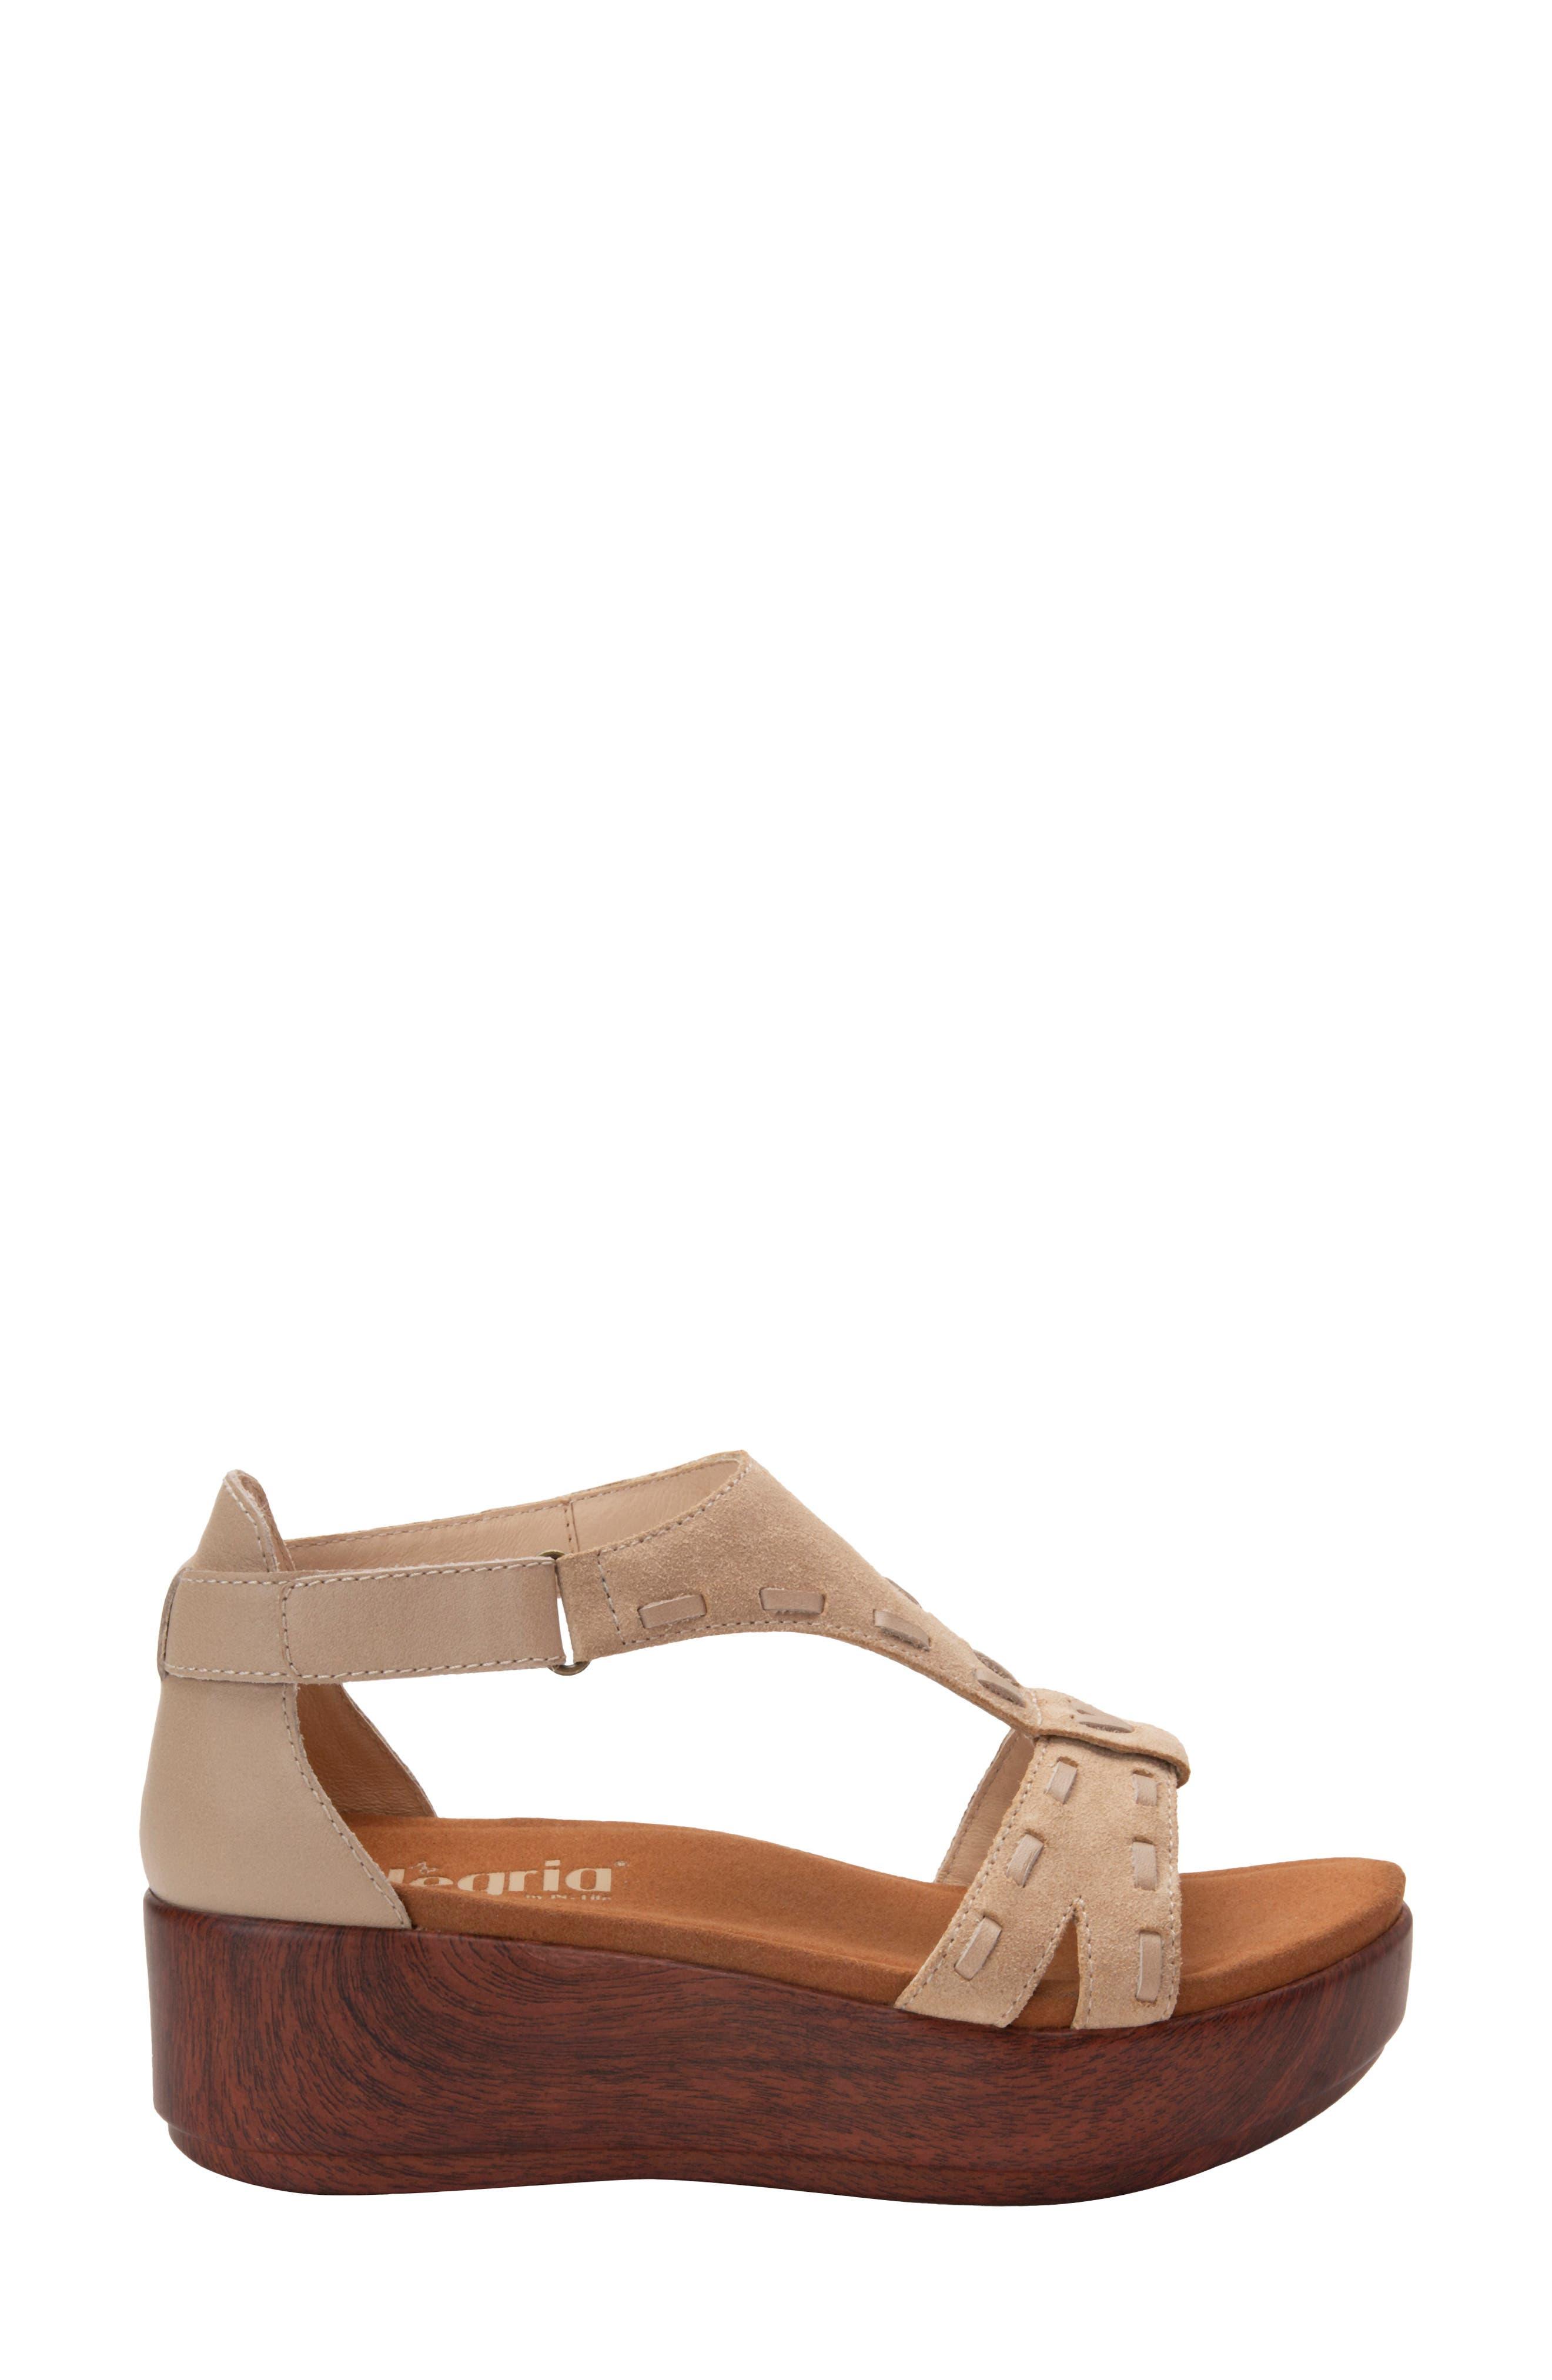 Women's Alegria Tova Platform Wedge Sandal